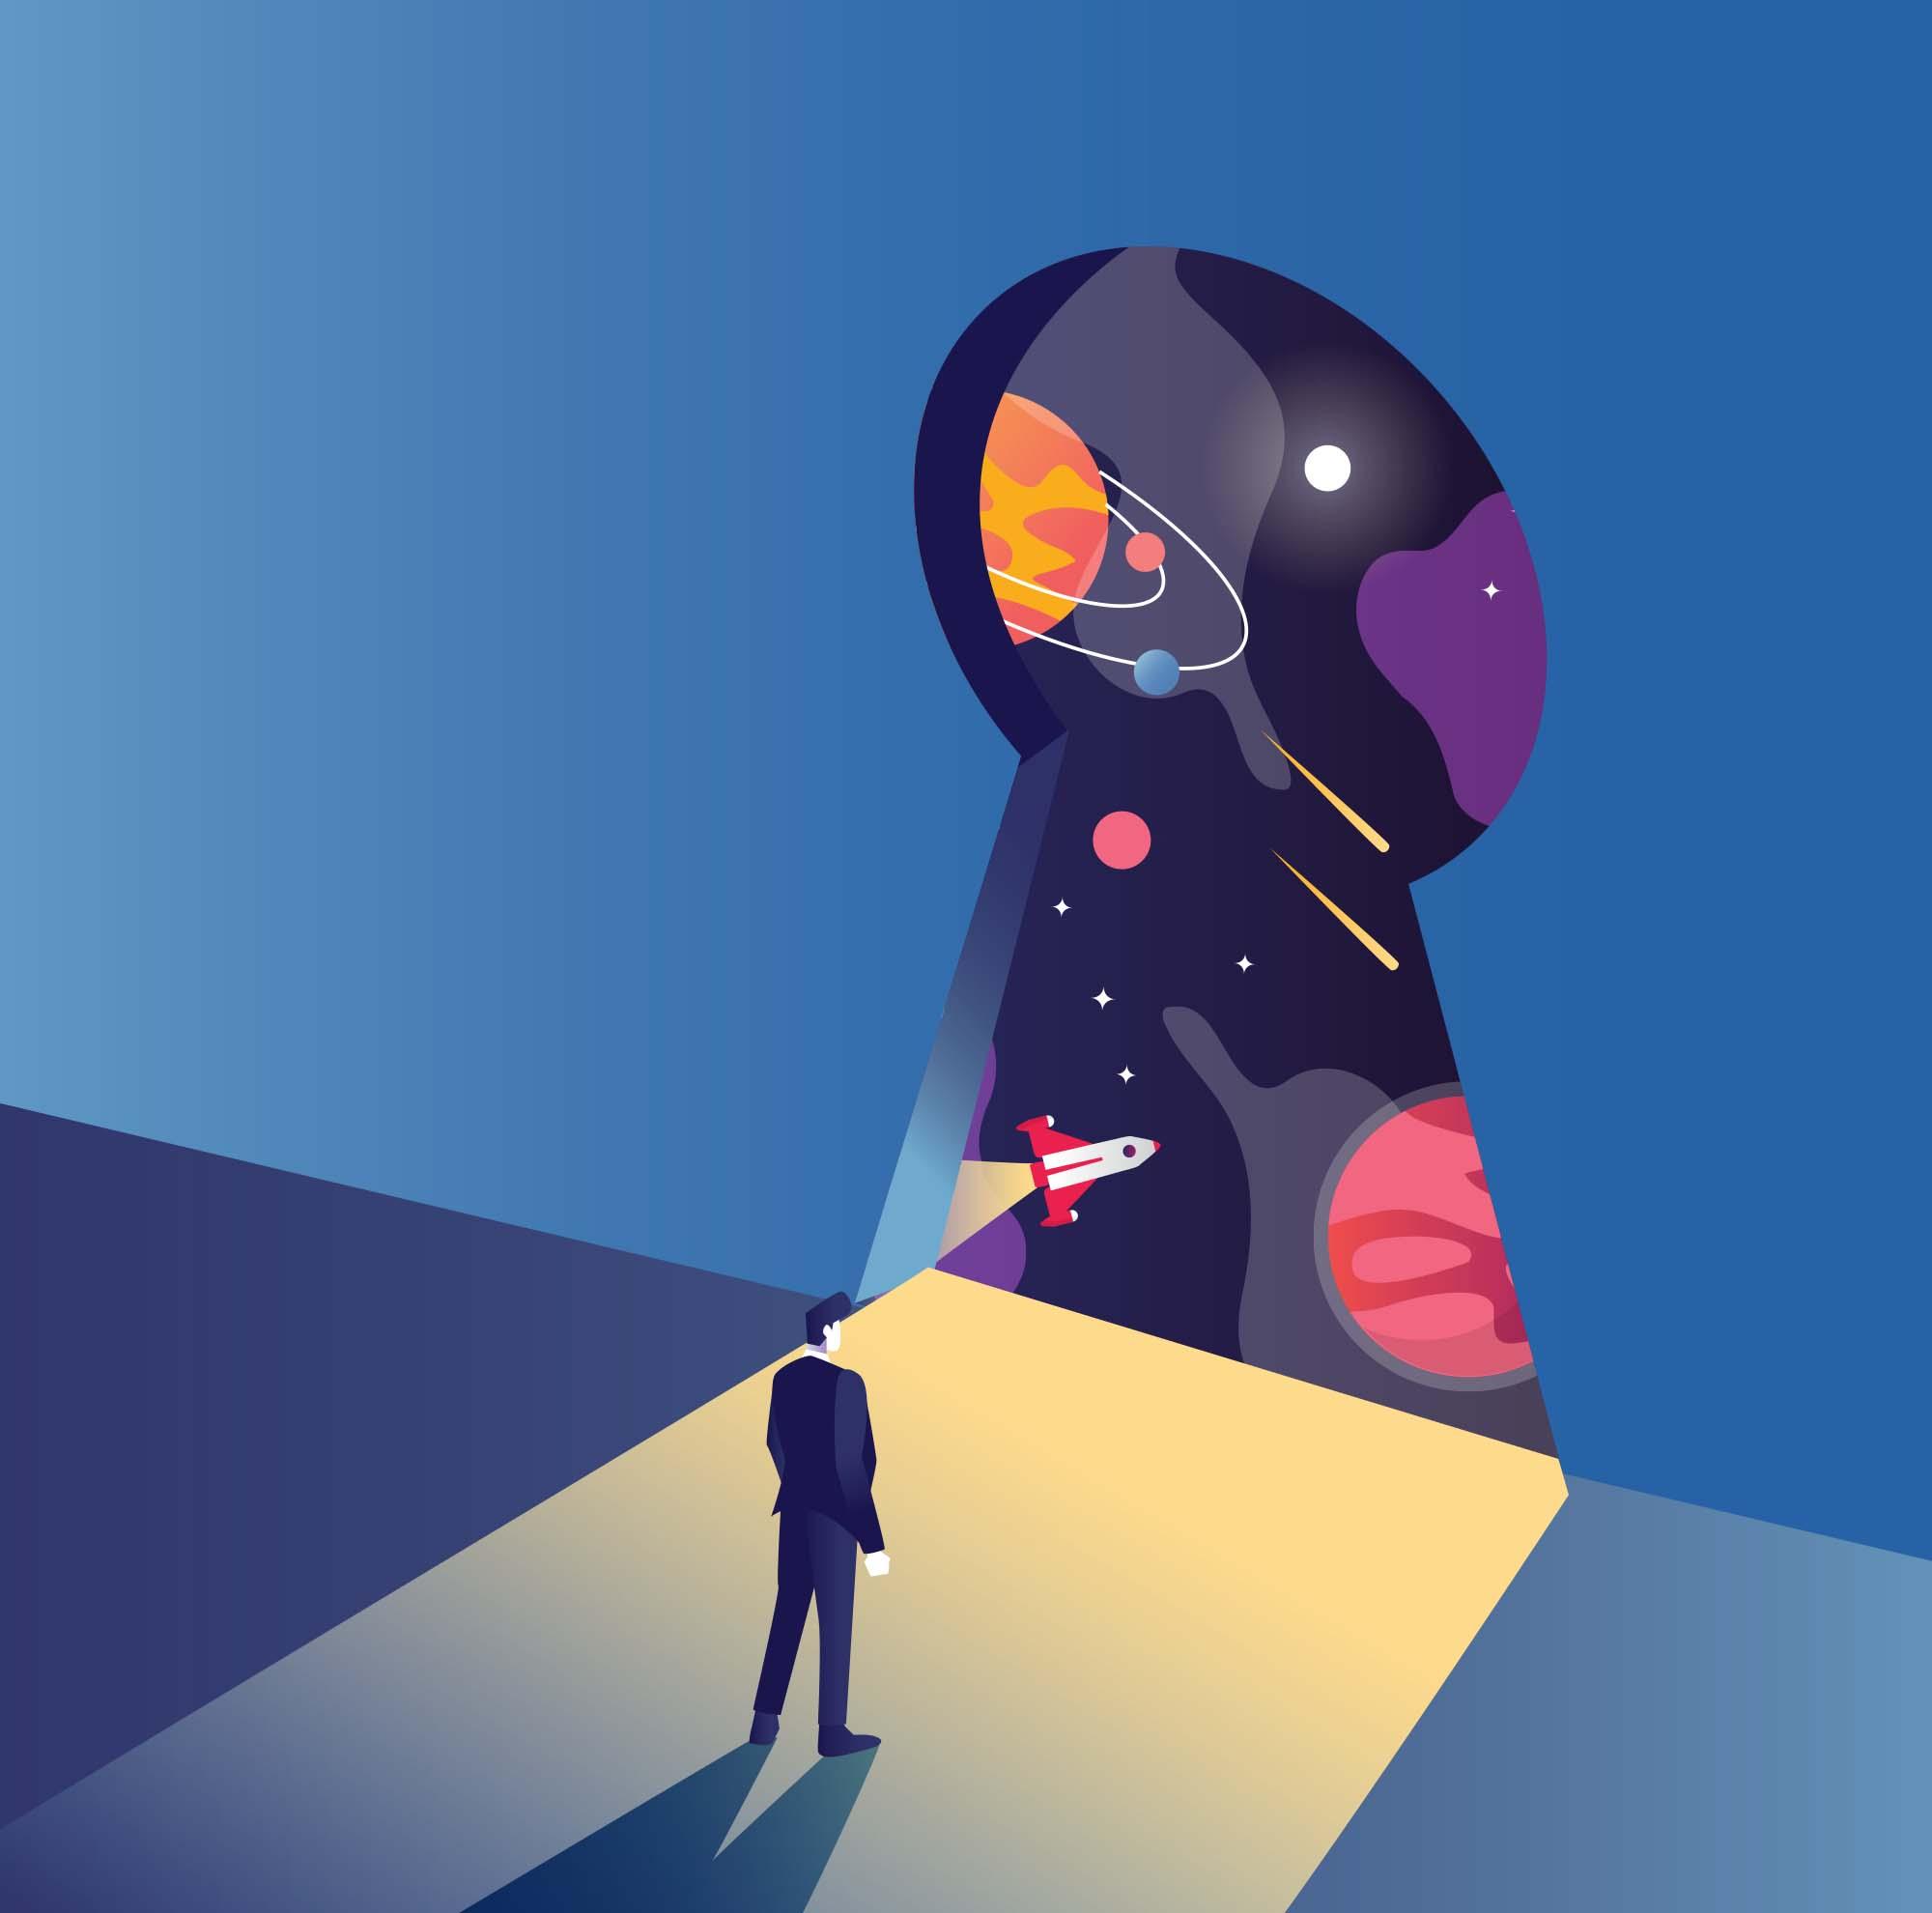 Universe Key Illustration